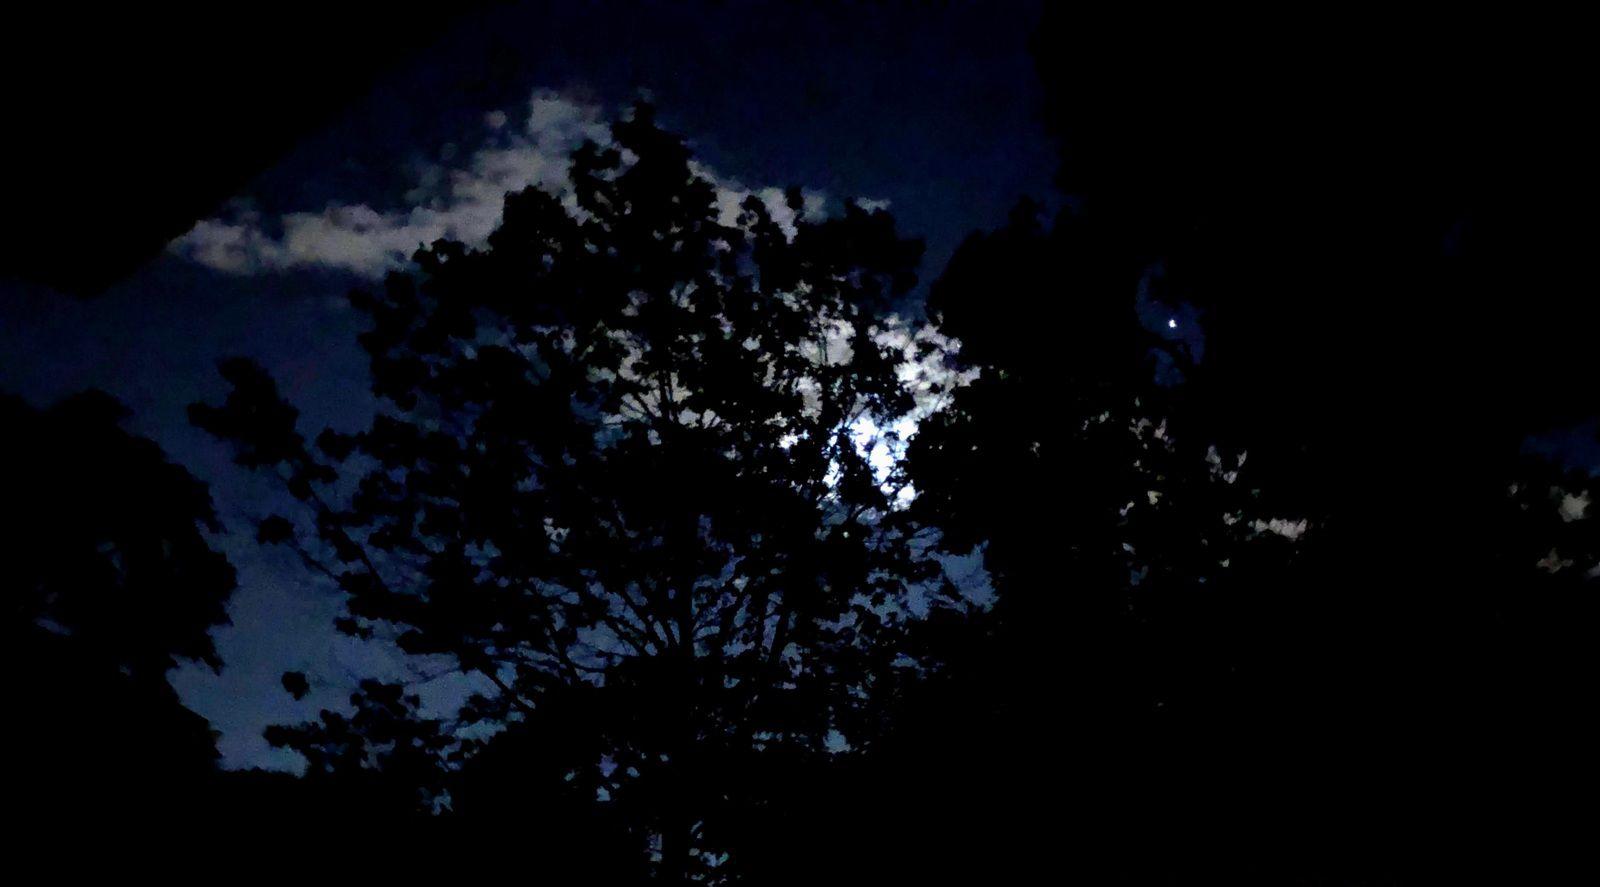 Moon hidden behind clouds